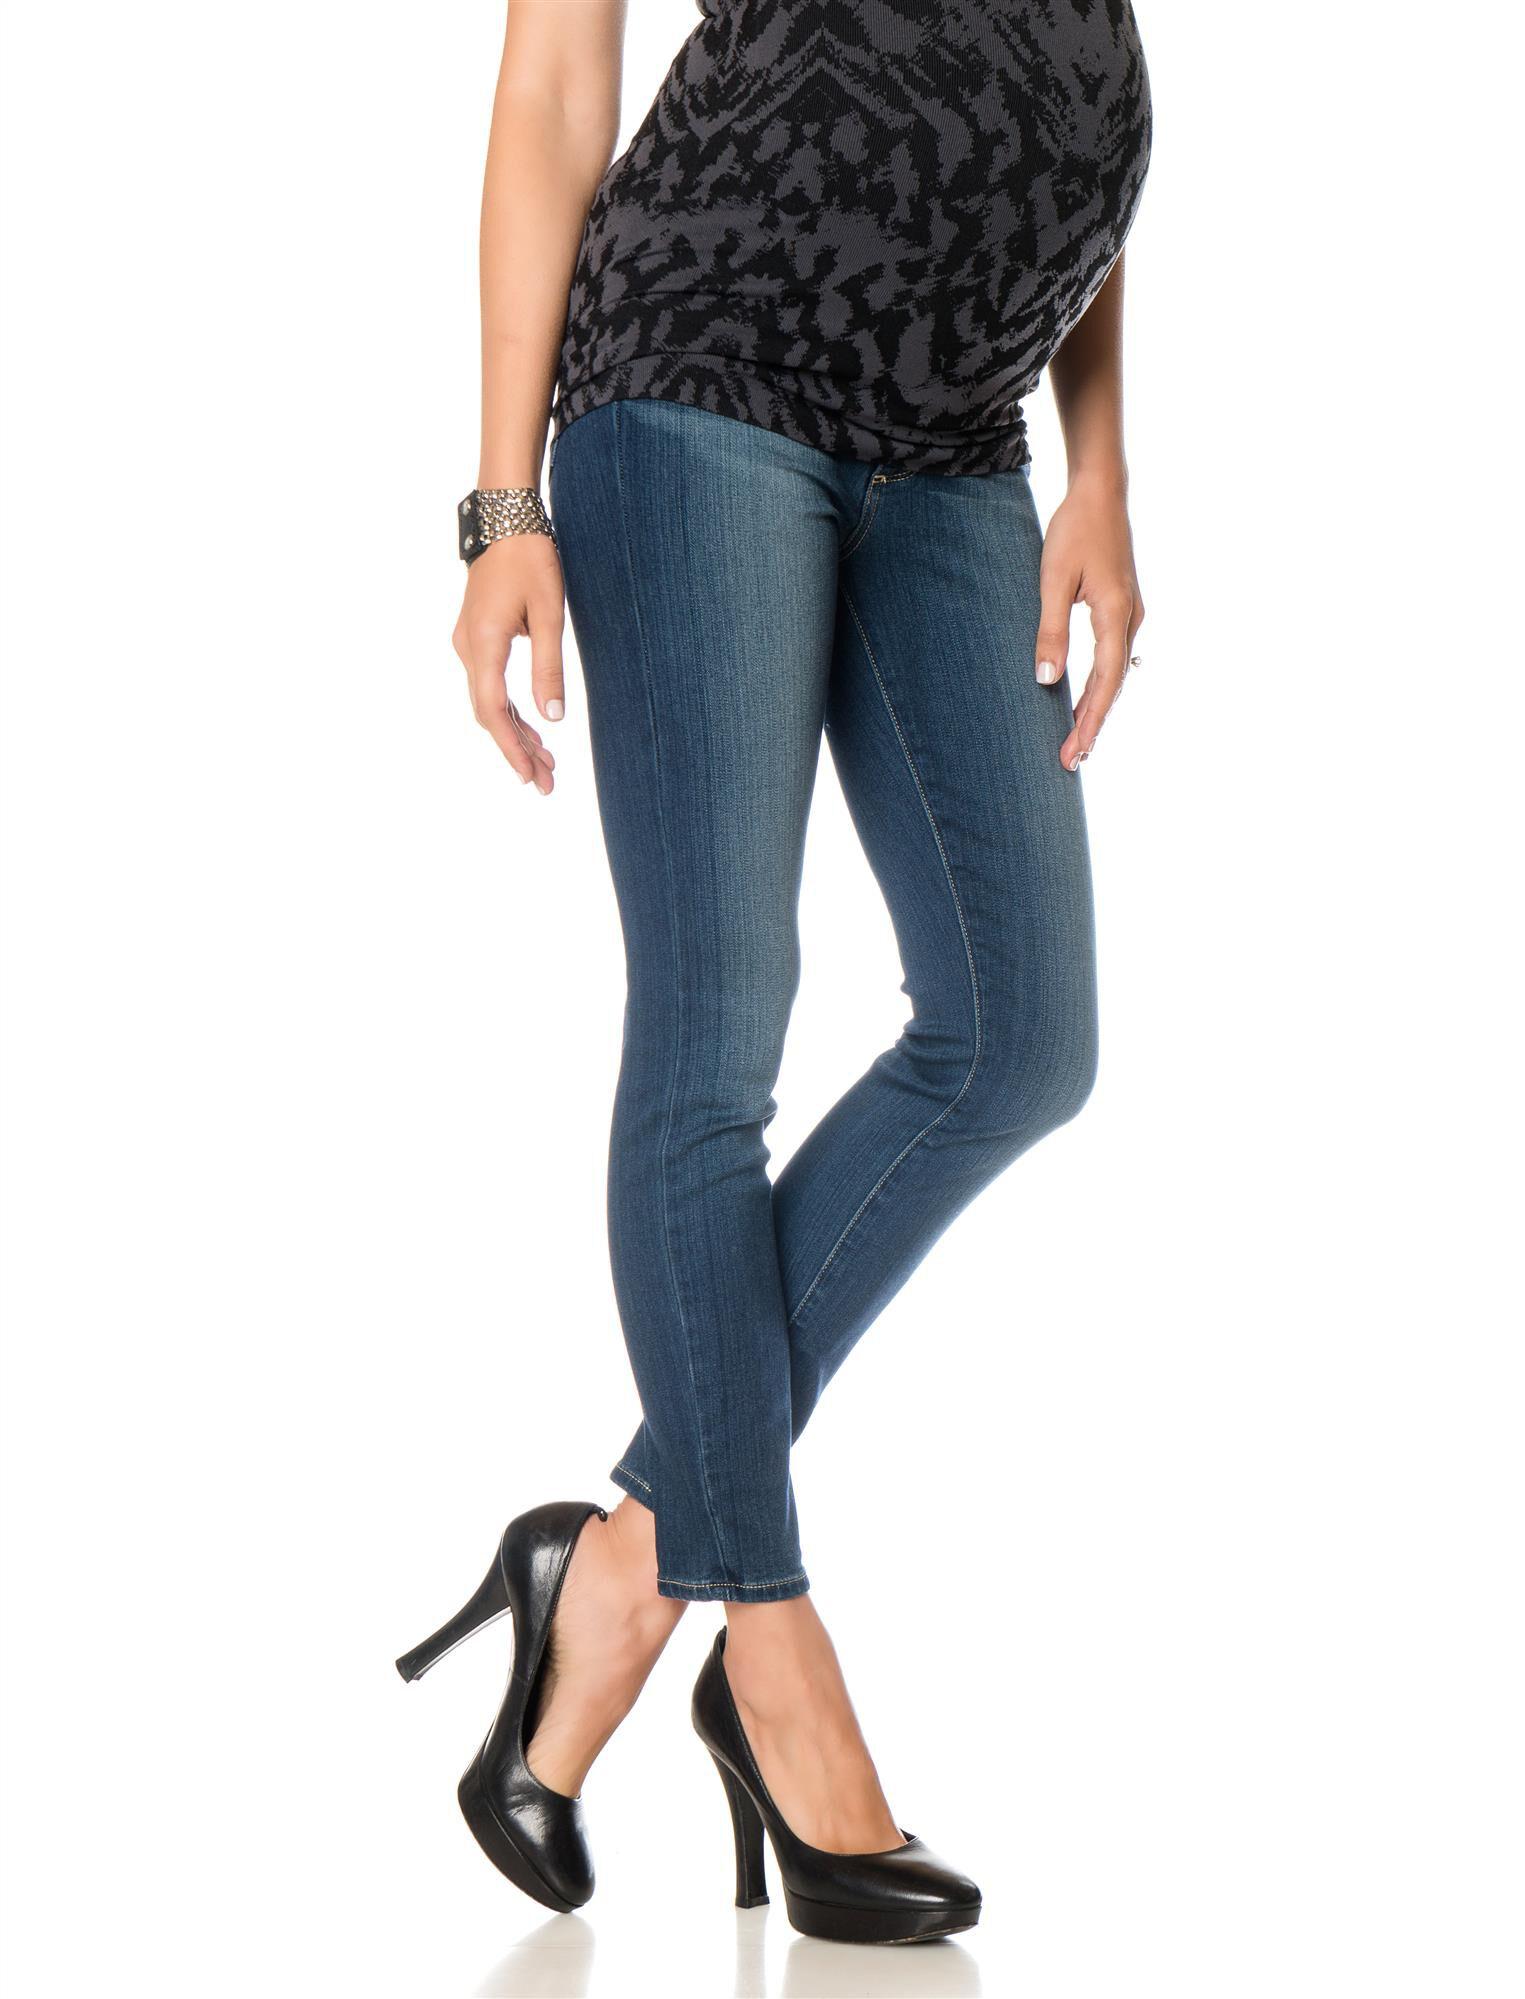 Paige Denim Secret Fit Belly Skinny Maternity Ankle Jeans